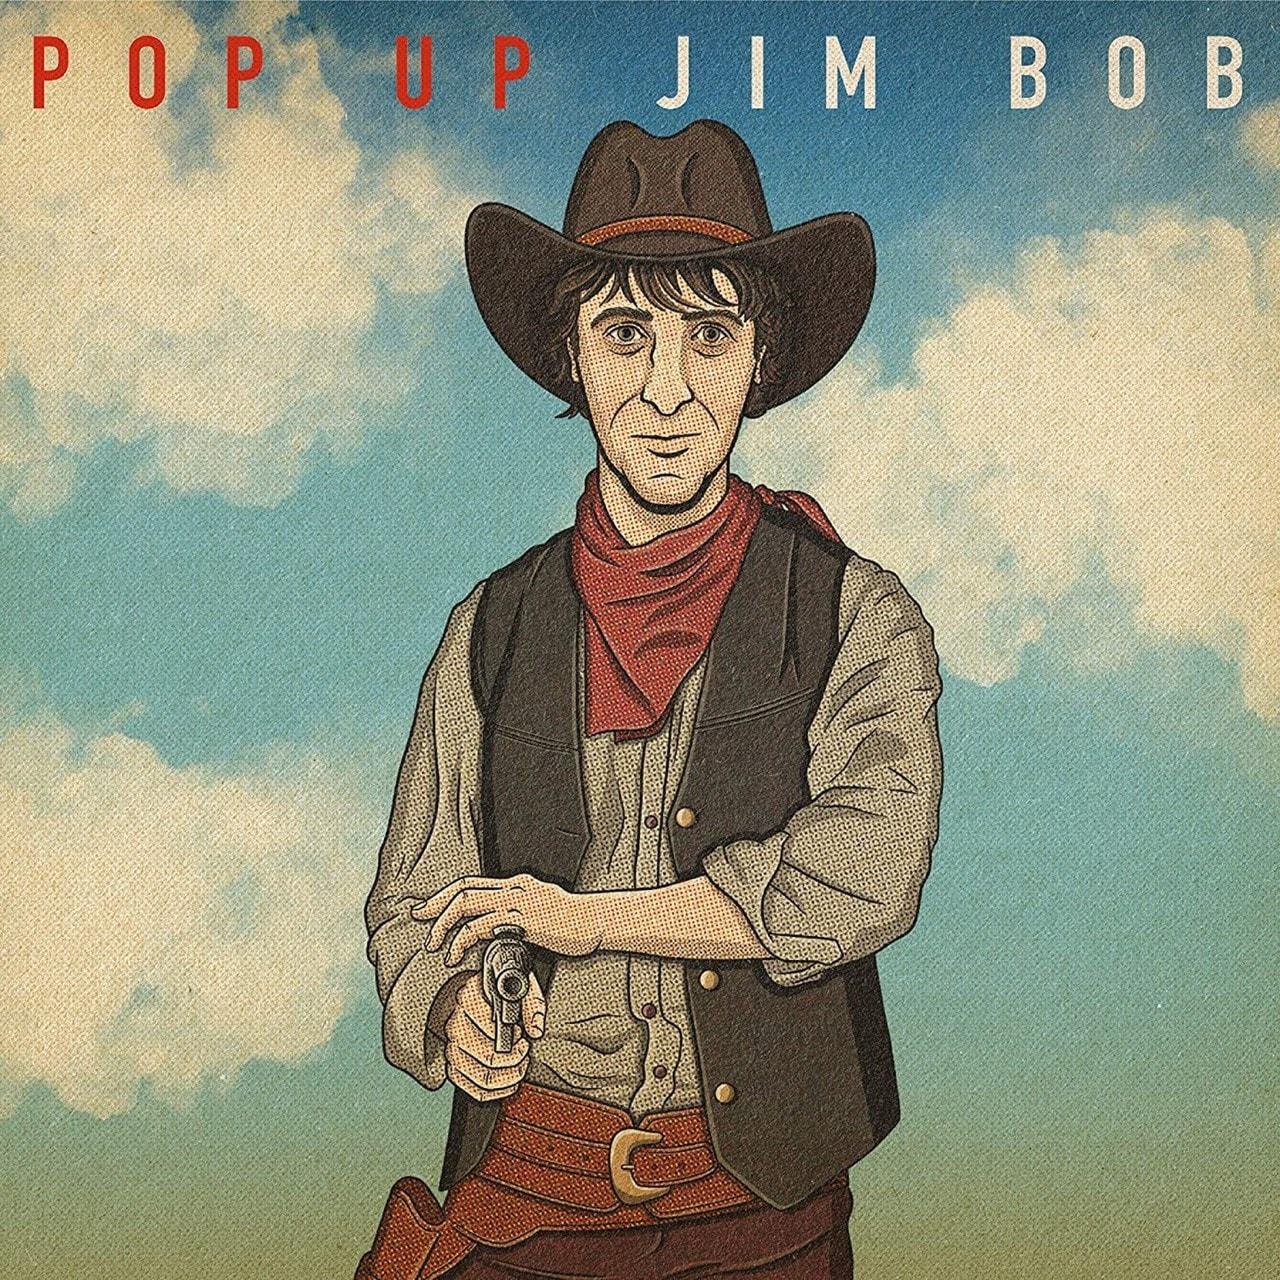 Pop Up Jim Bob - 1